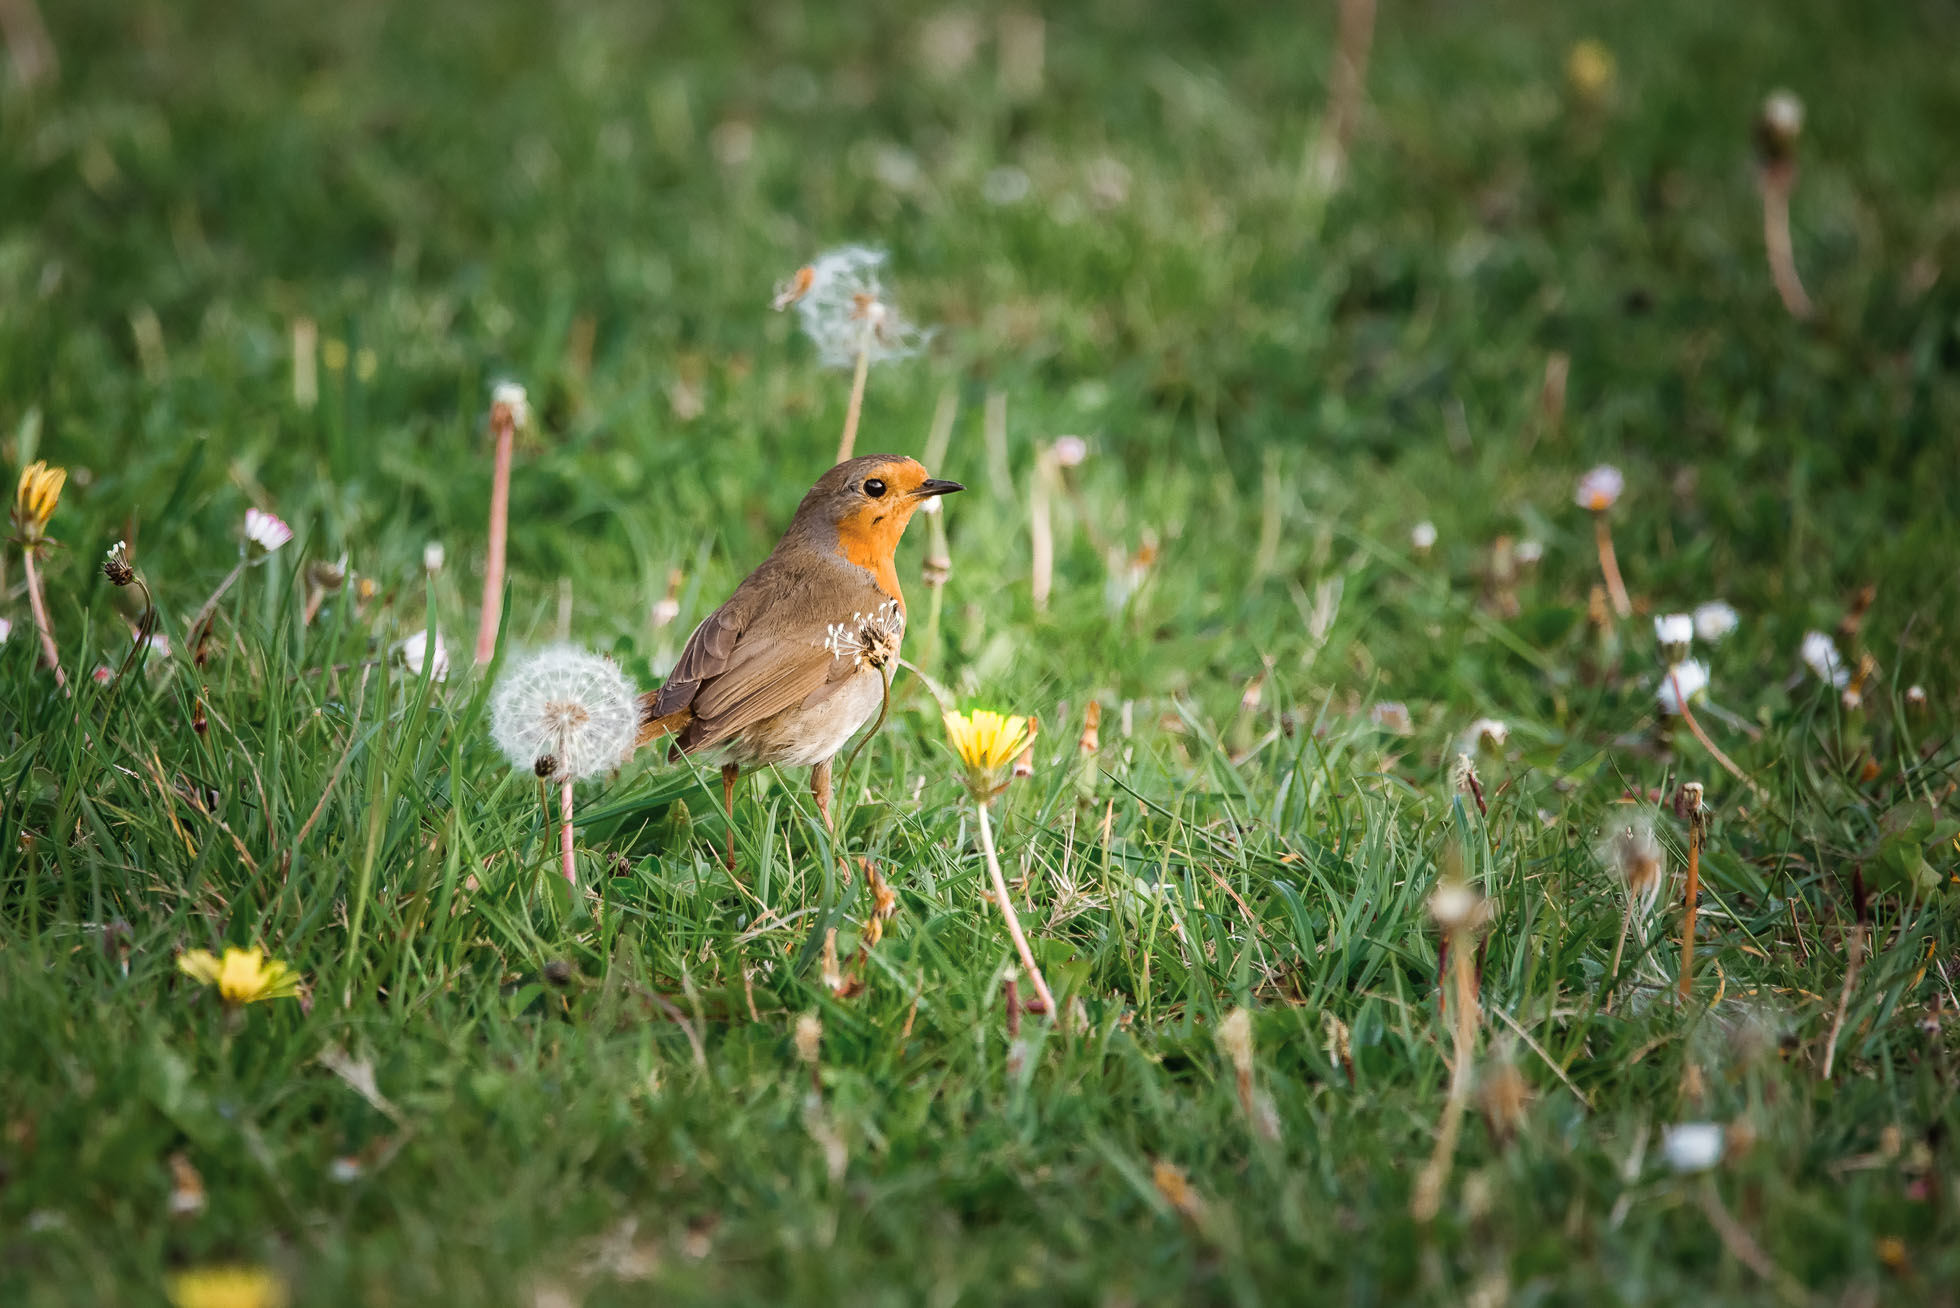 shilpaharolikarphotographwildlifebirdrobin-